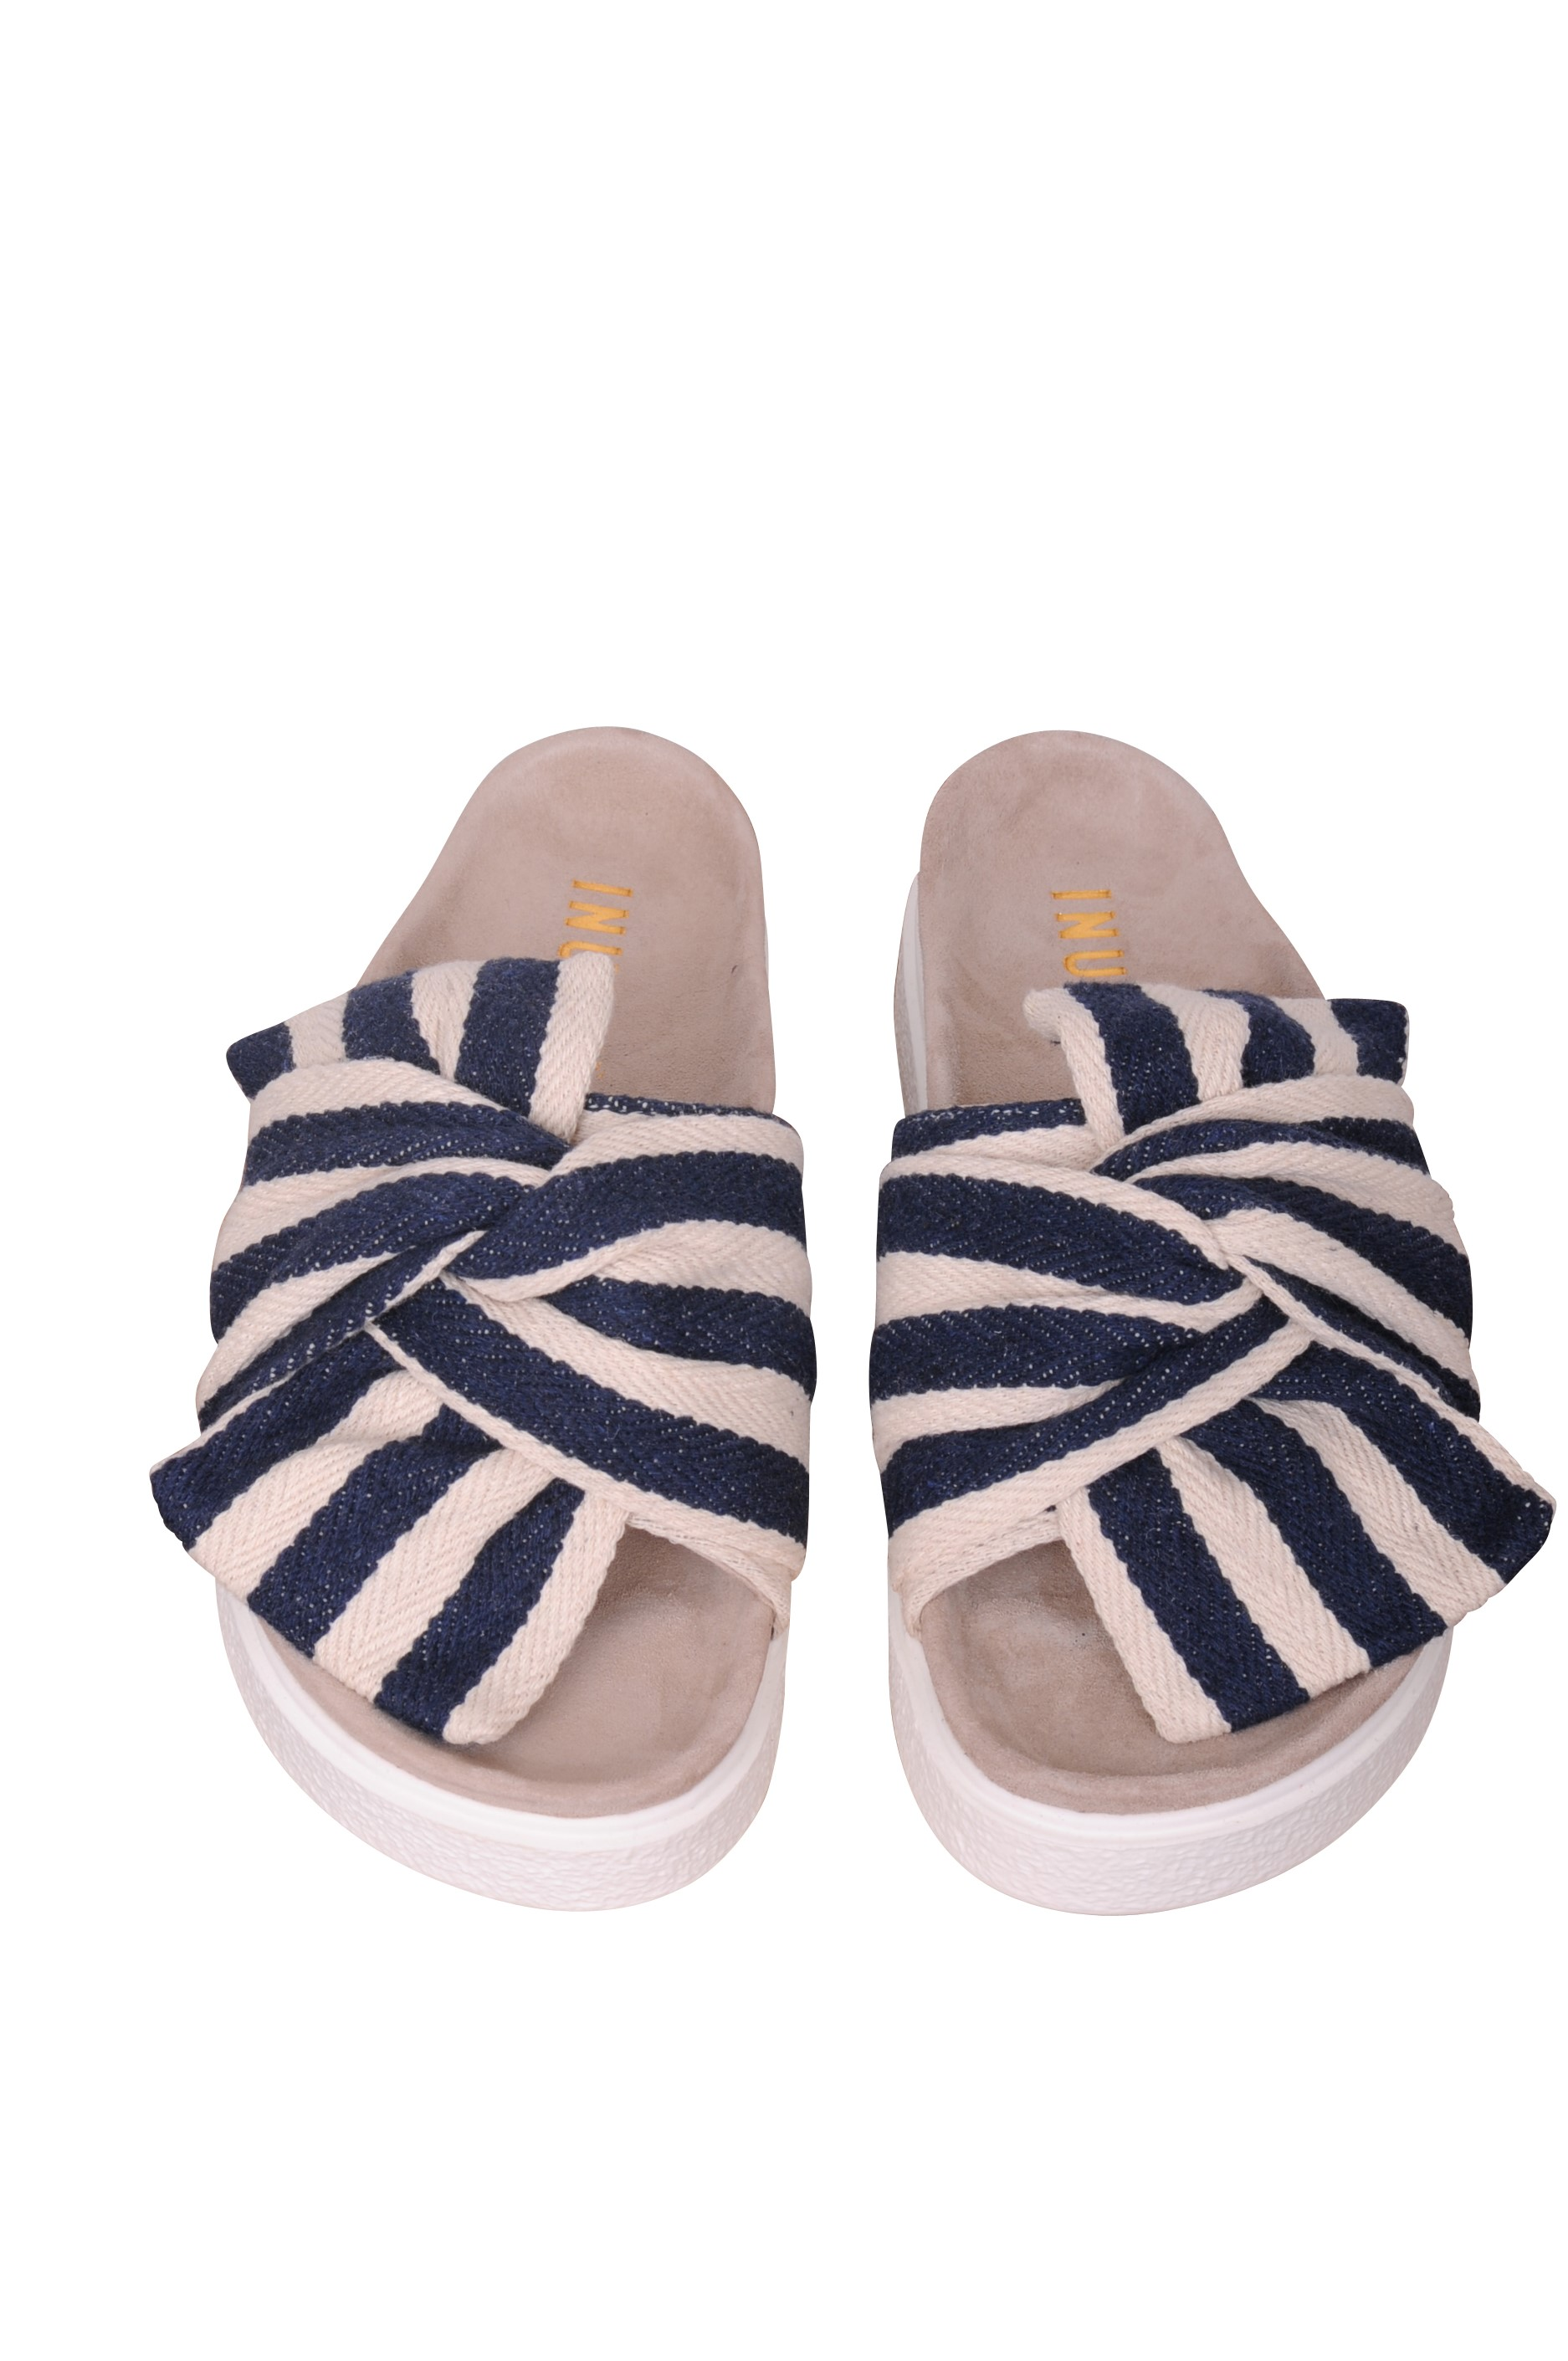 Inuikii Sandale mit Knotendetail | Sandalen, Schuhe